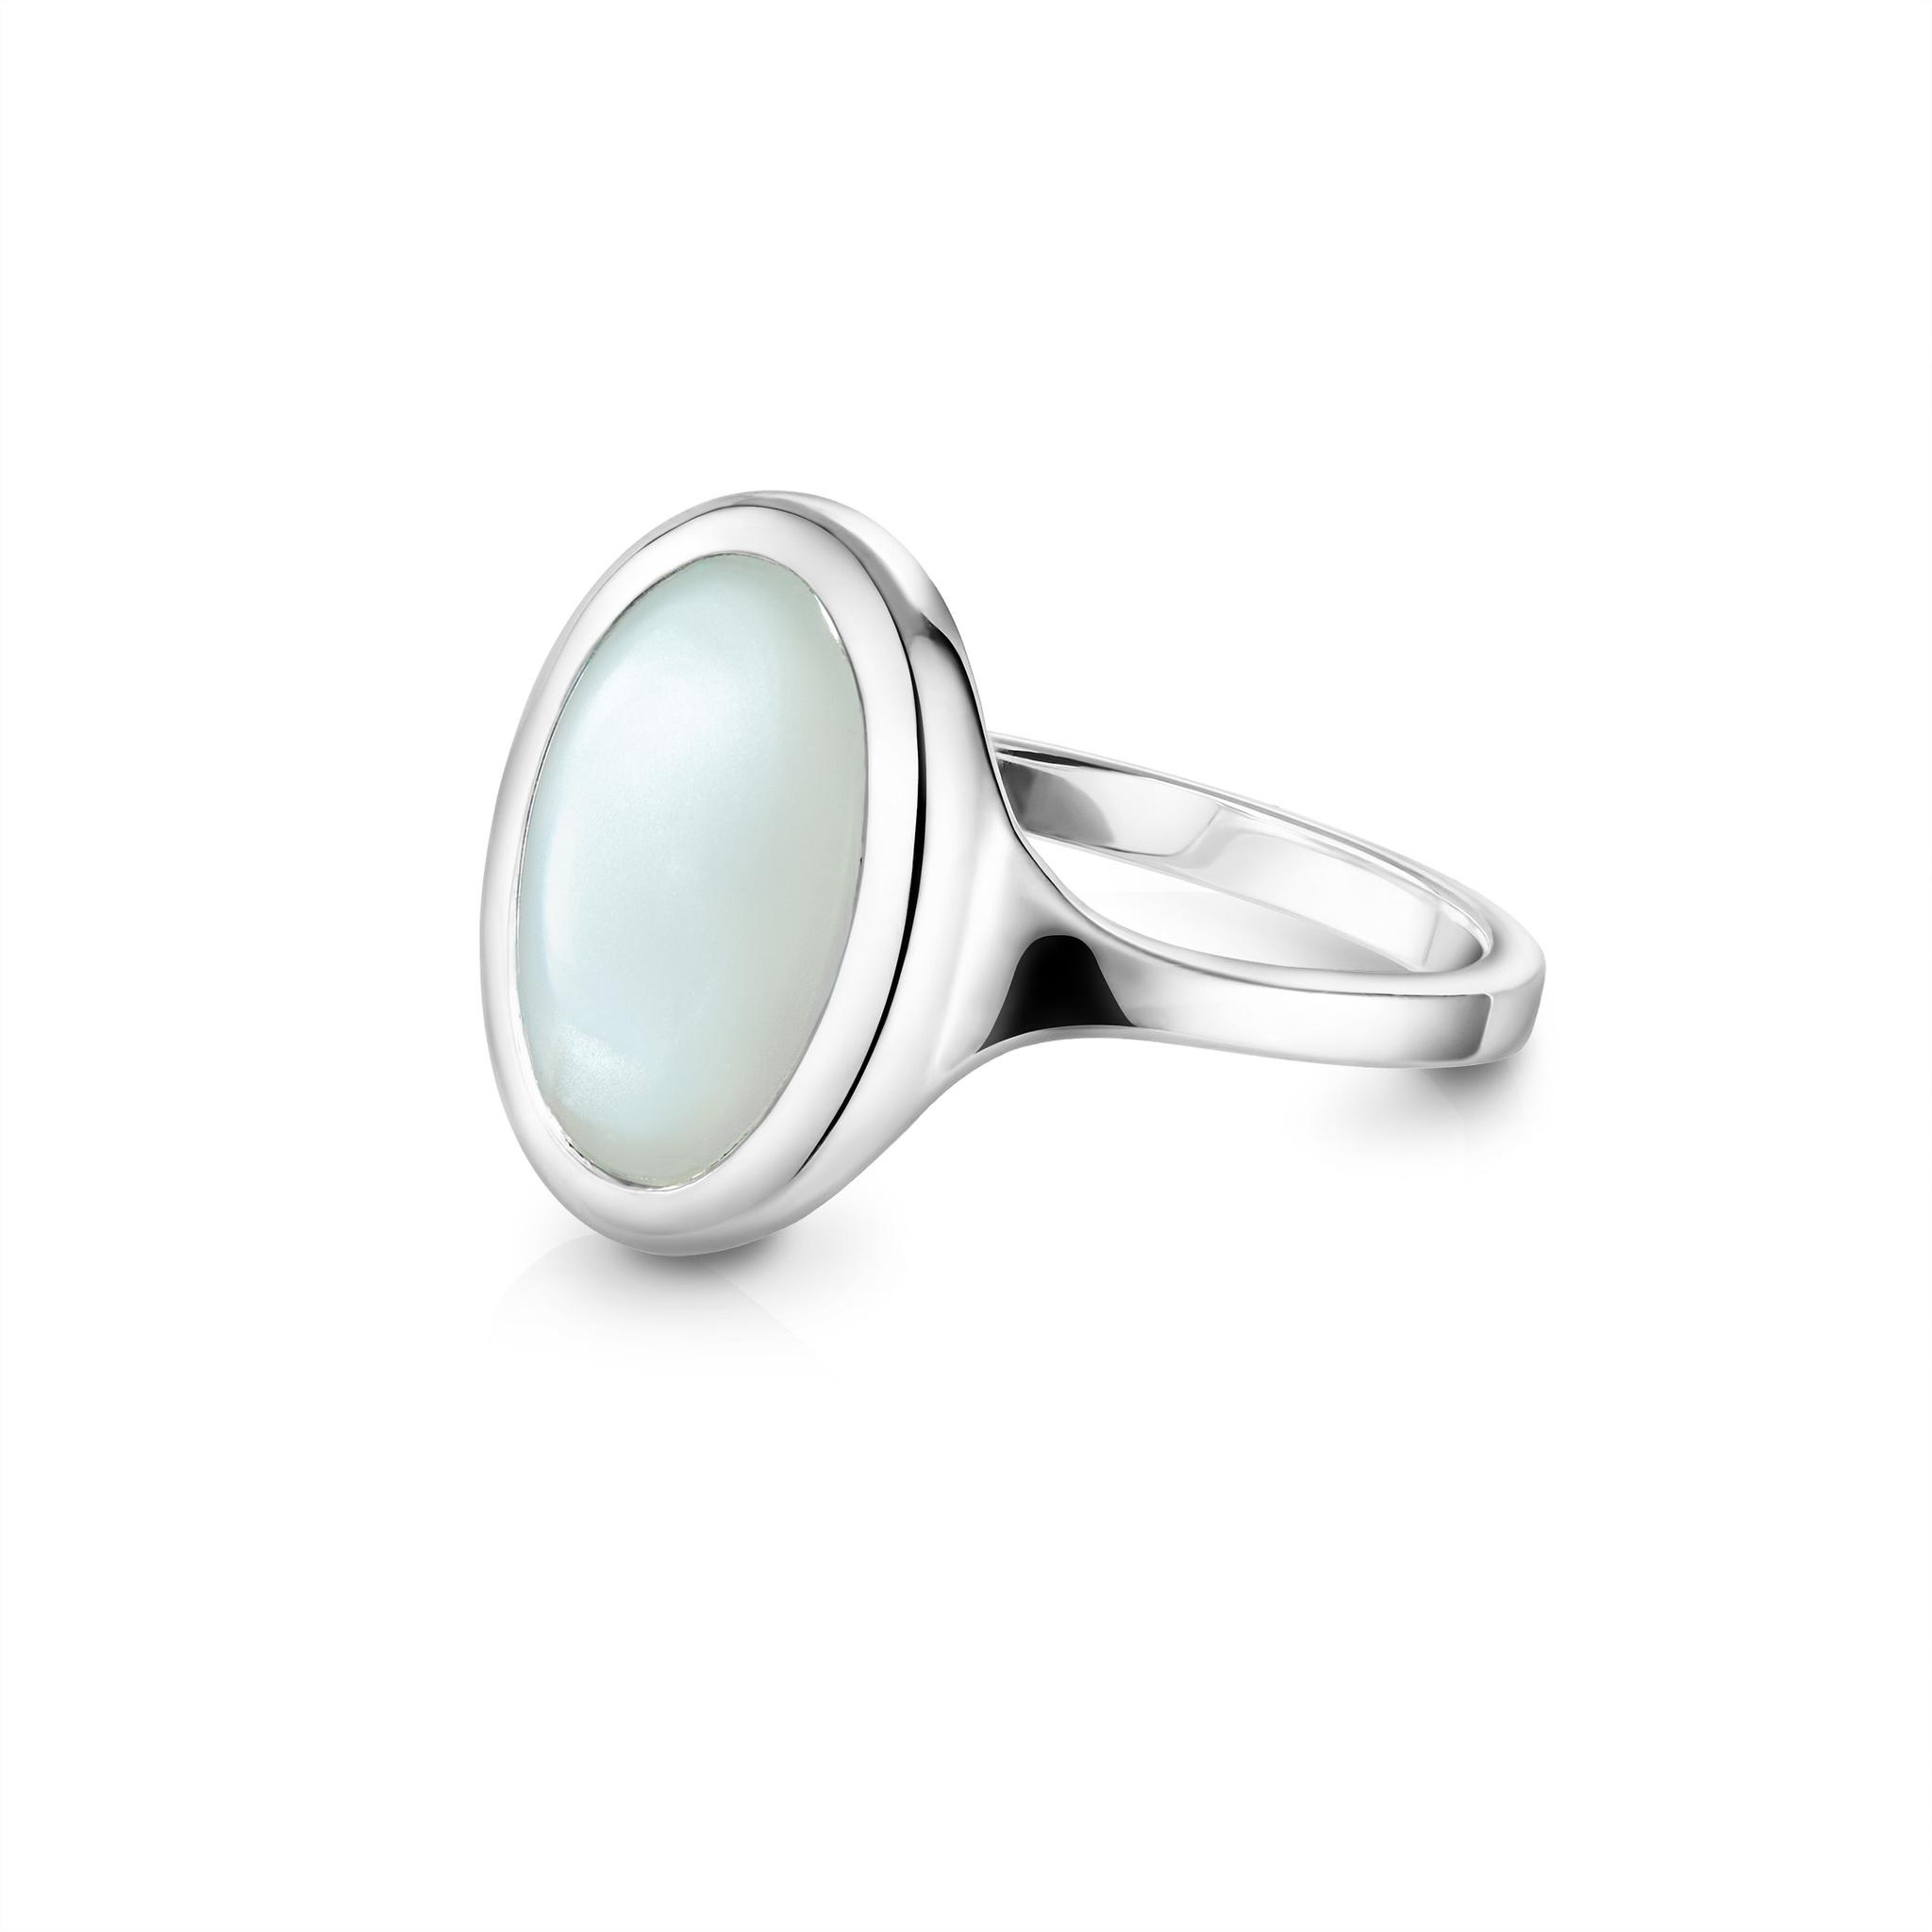 Кольцо OMEGA - Шёлковый лунный камень